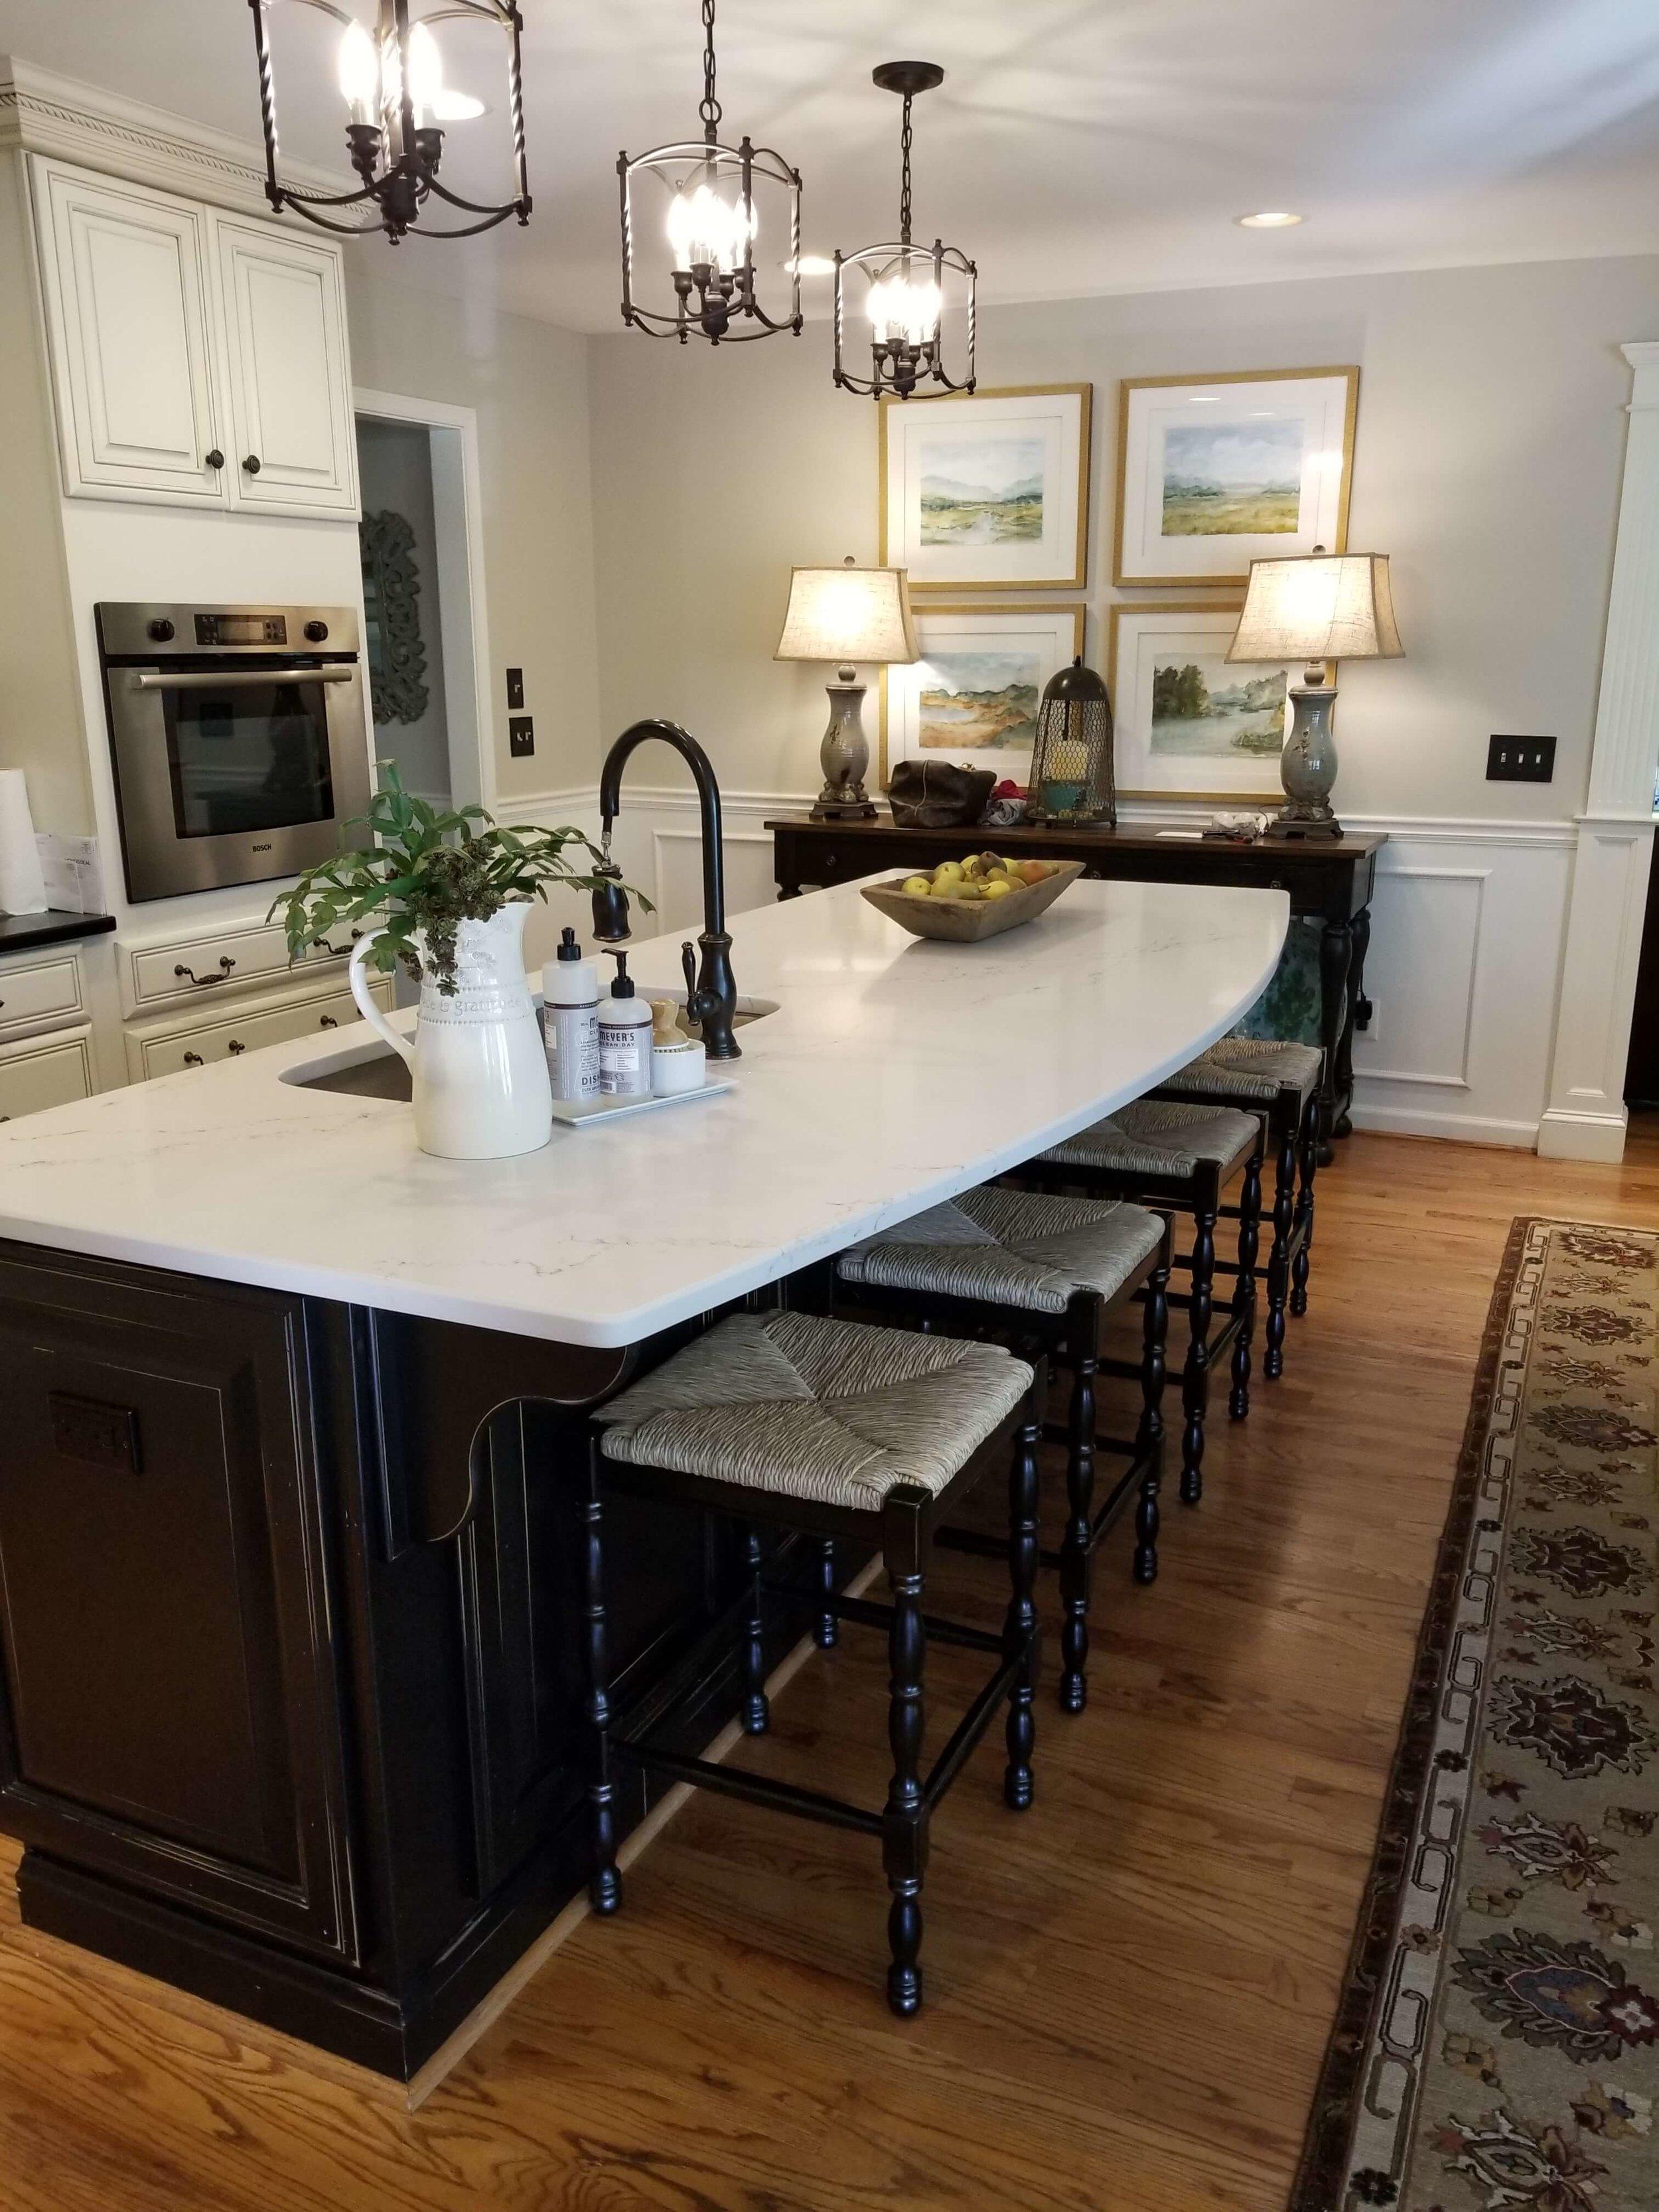 Kitchen Island Countertop Change